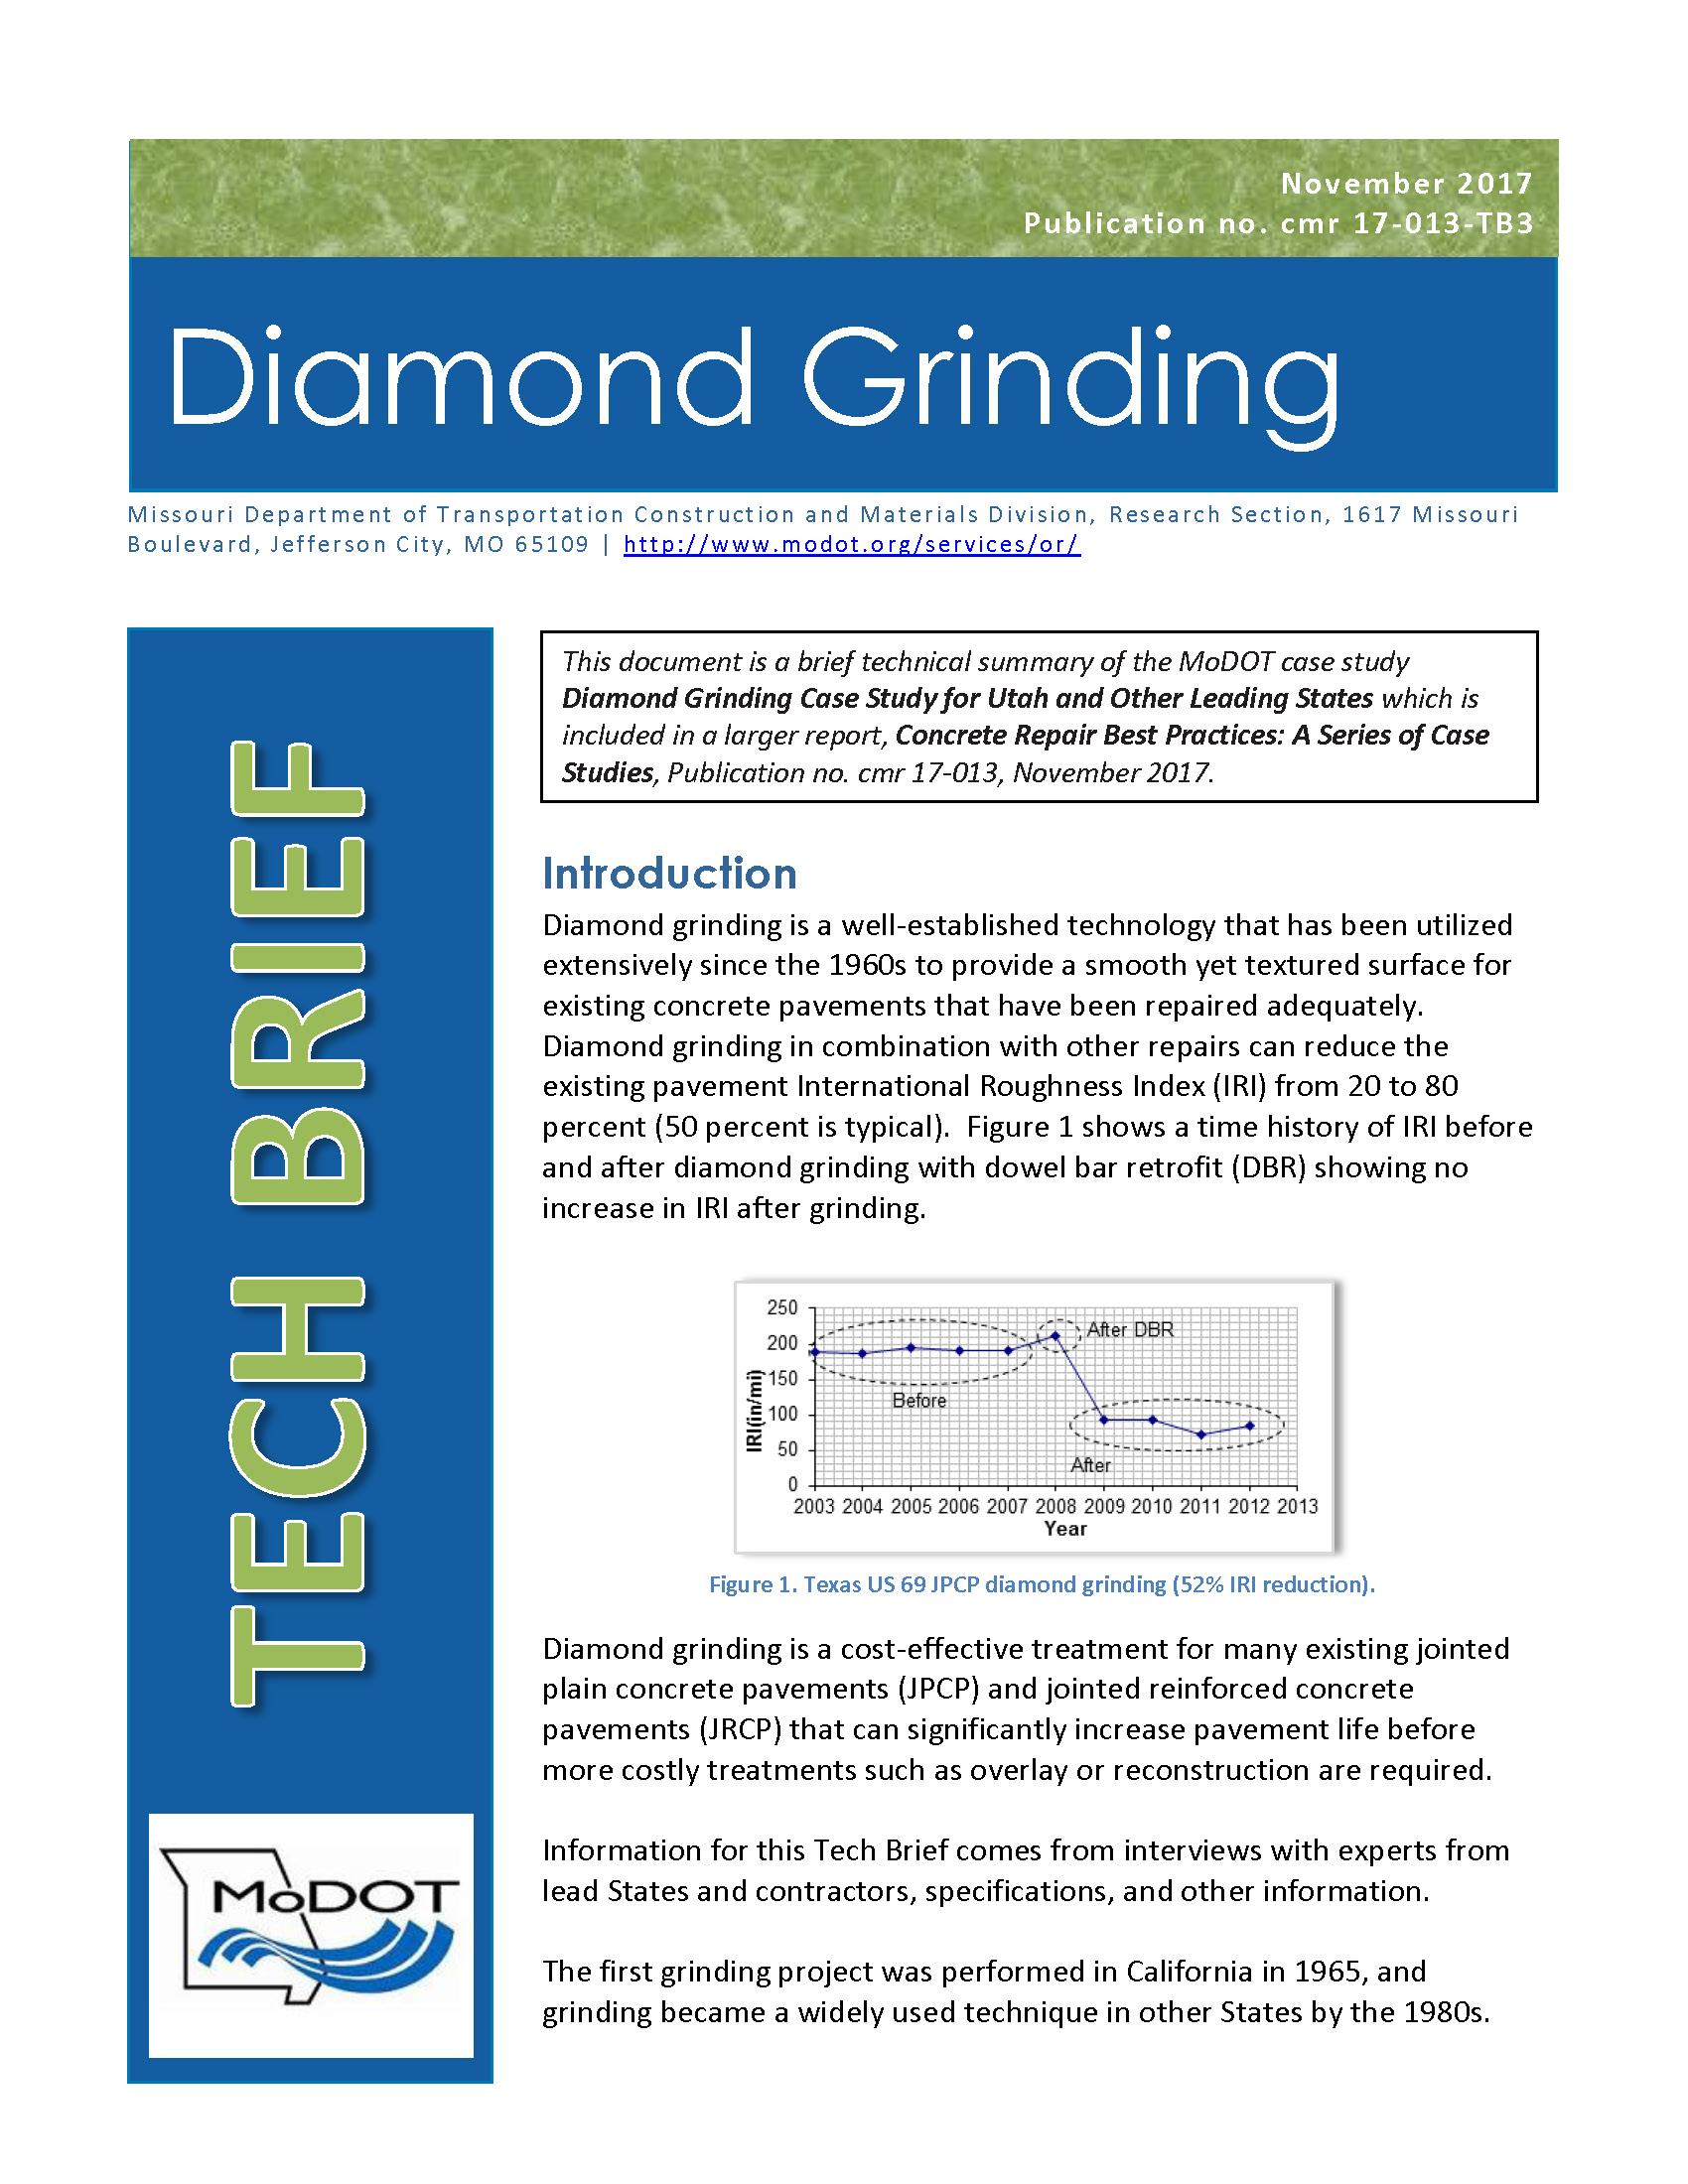 Diamond Grinding